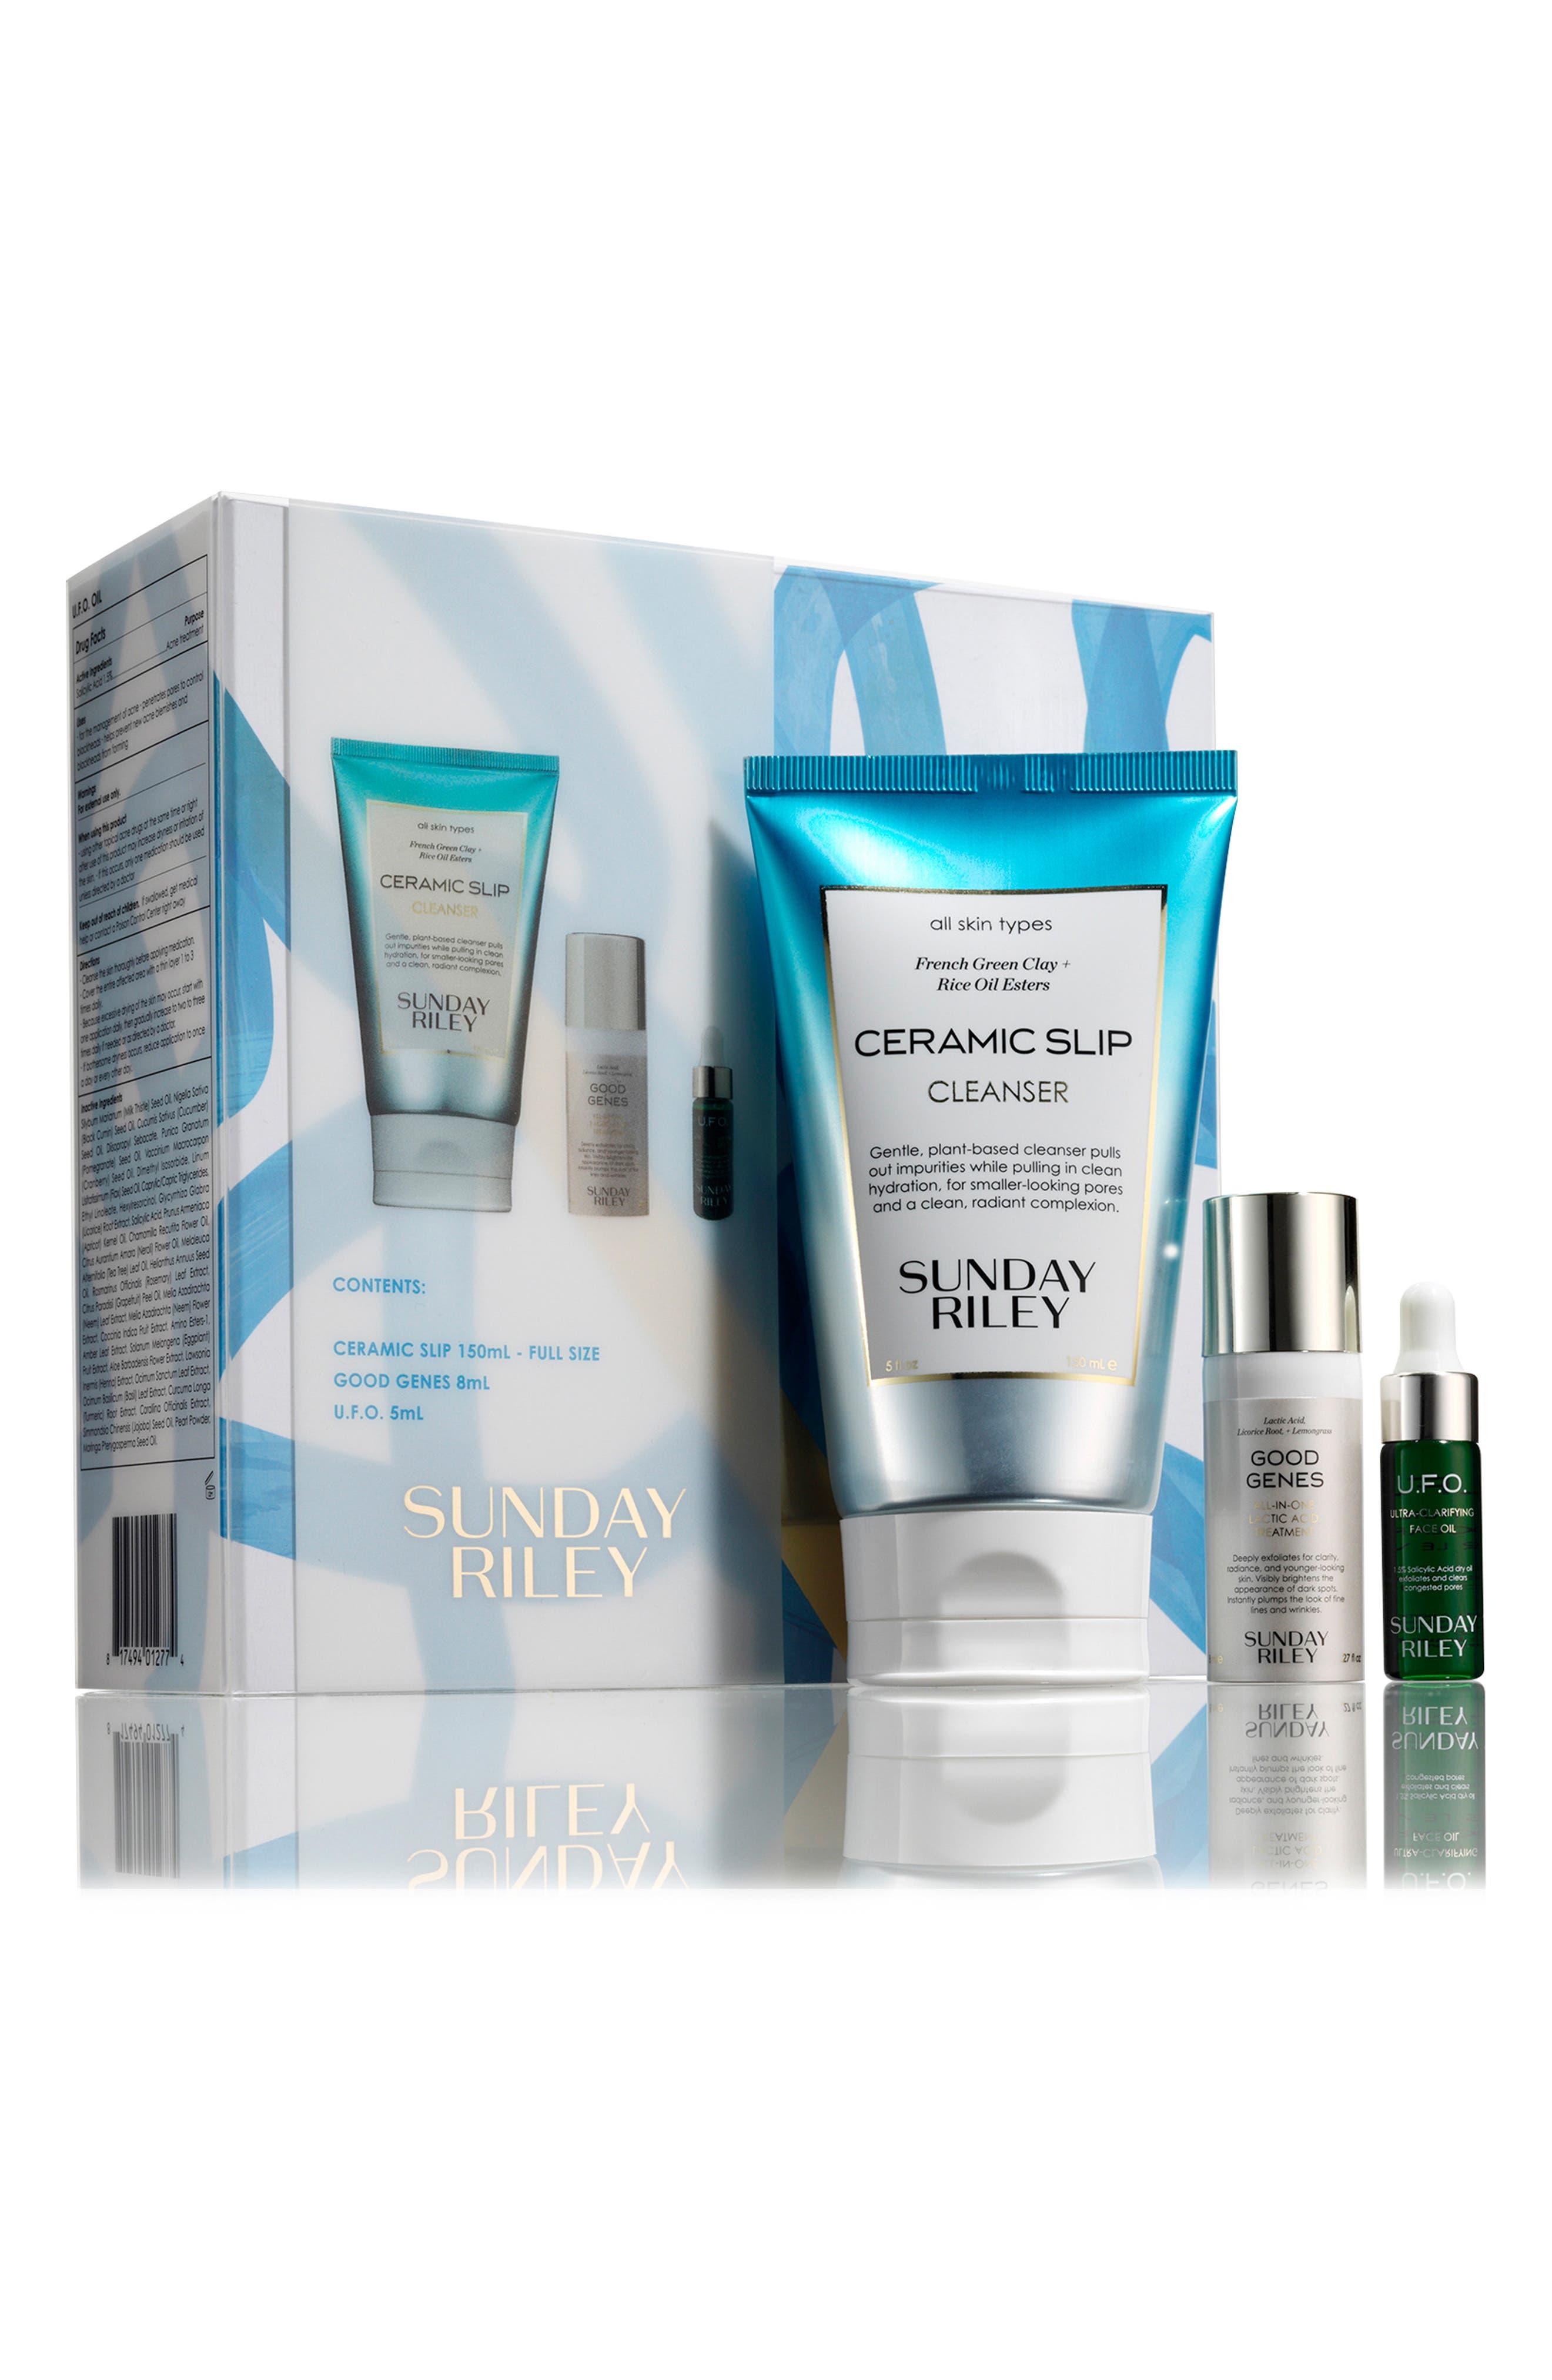 SUNDAY RILEY Cleanse + Detox Kit